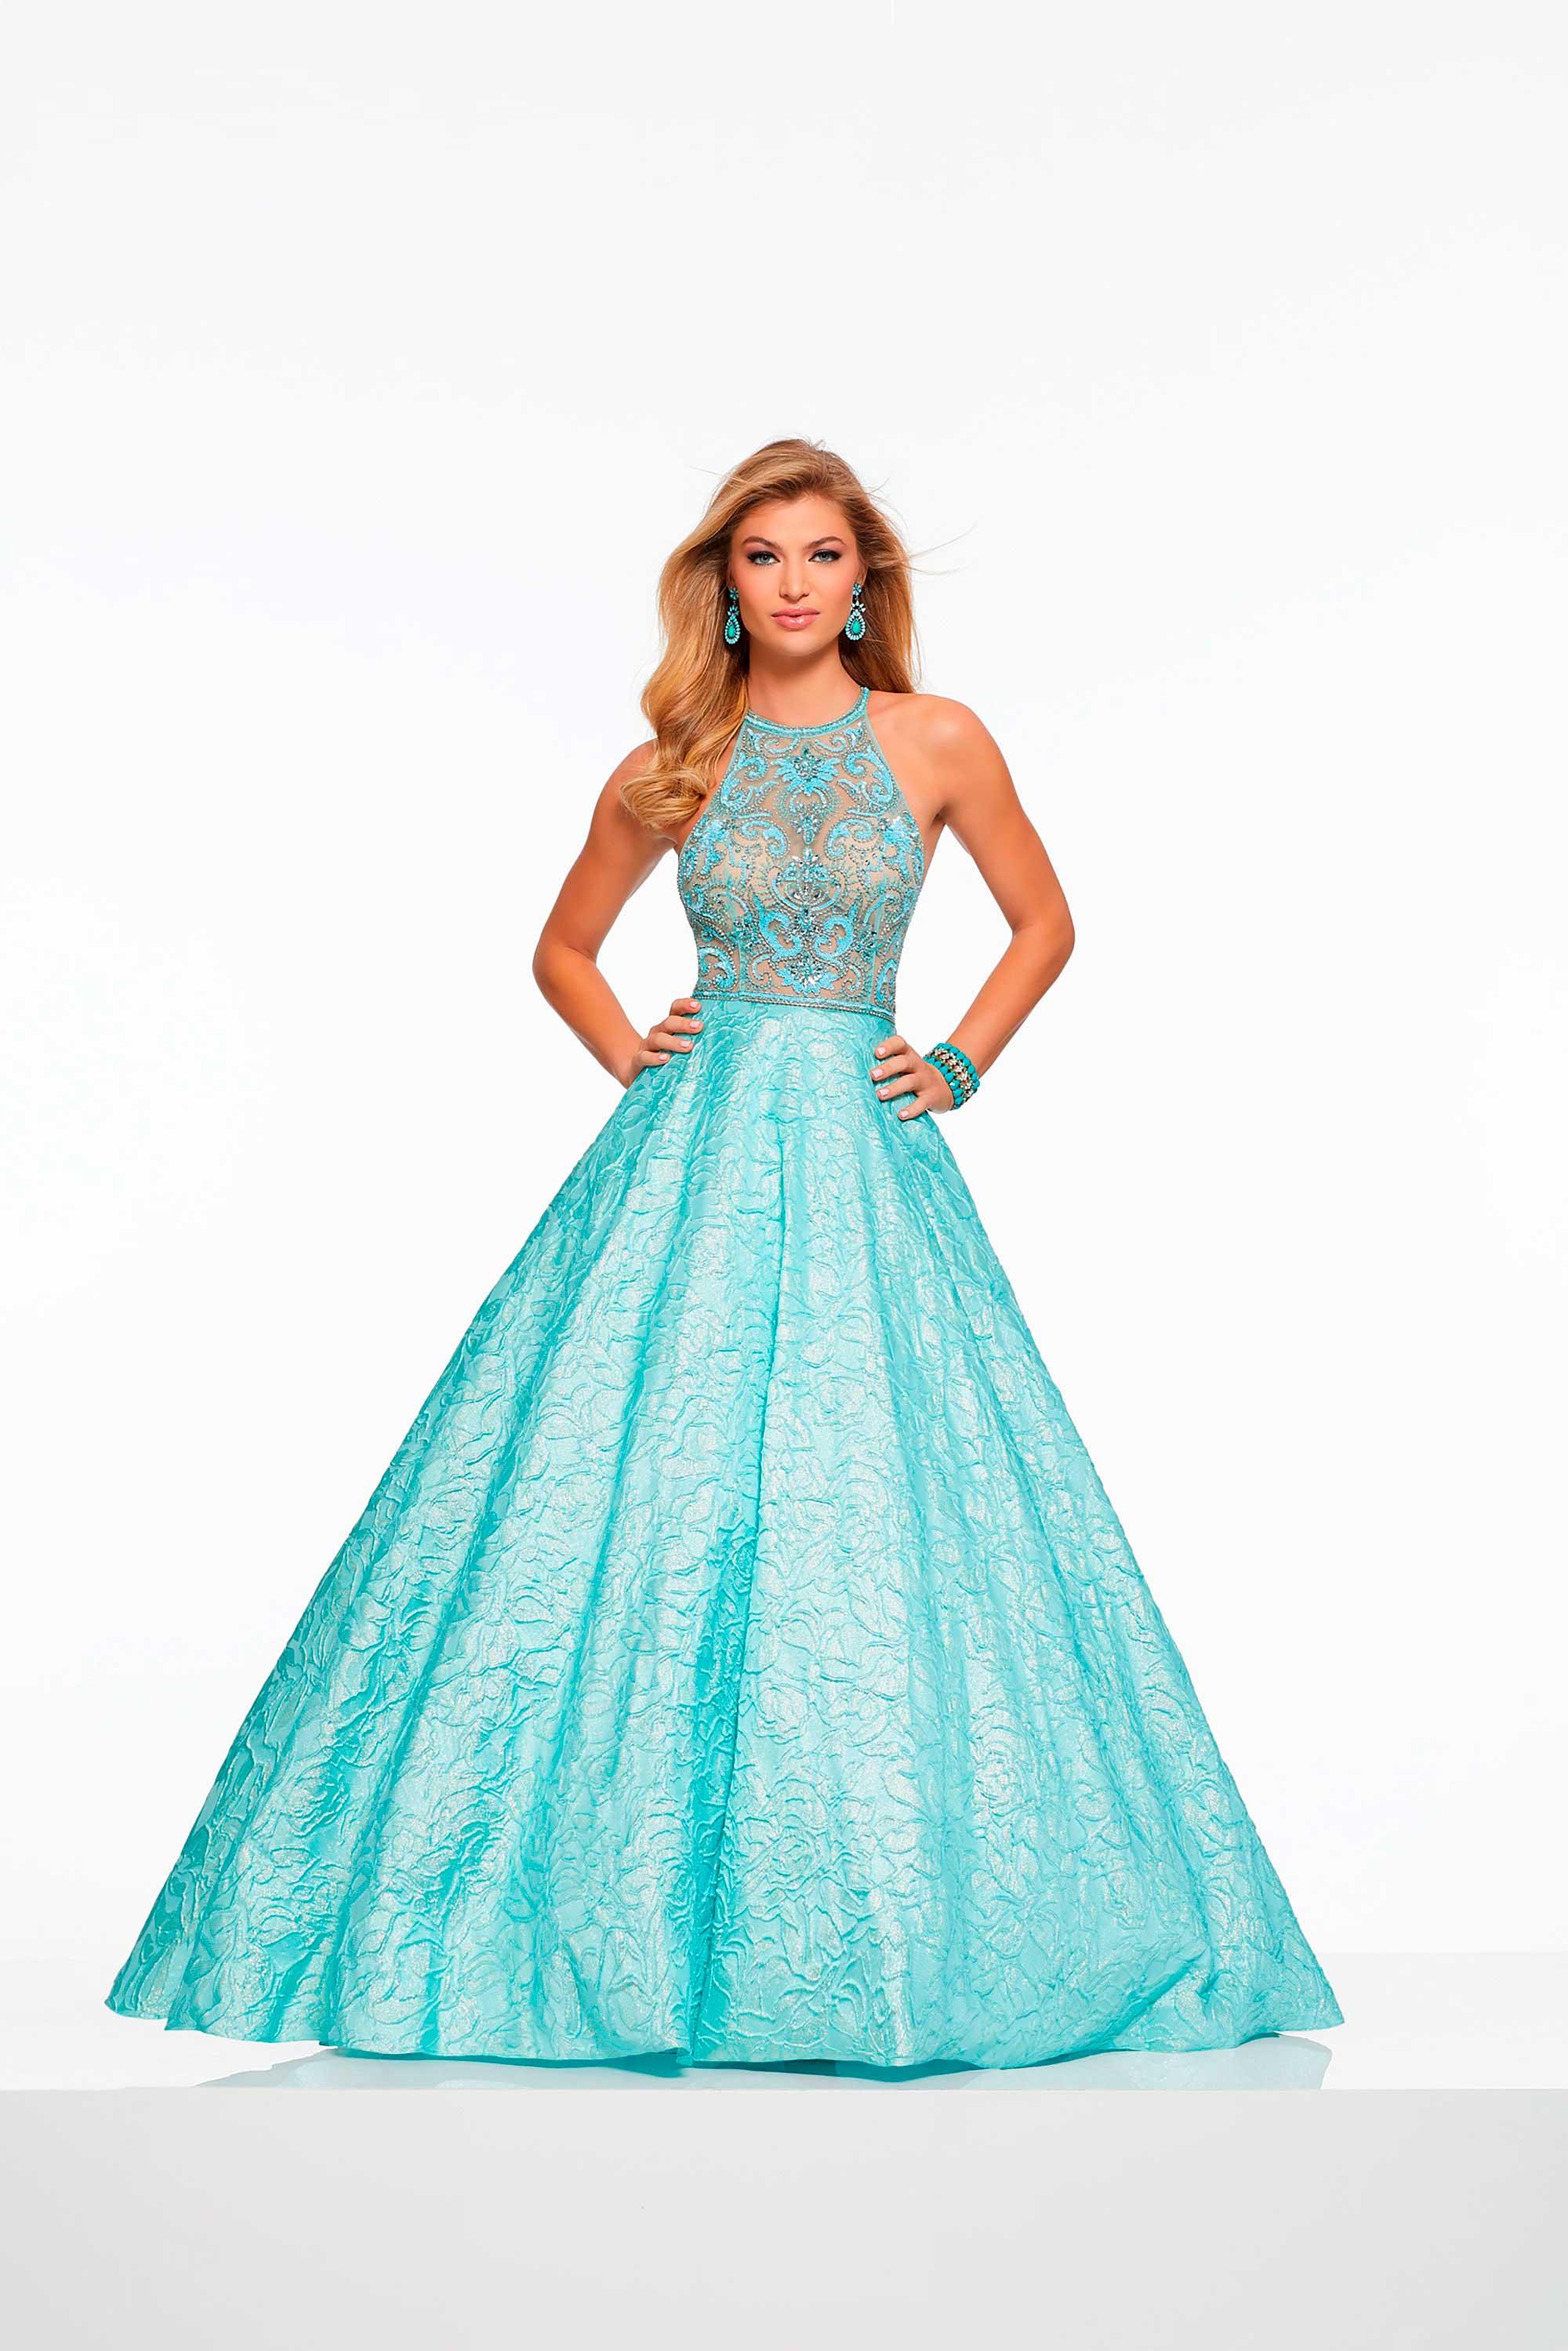 Vestido Lucía Fiesta 2019 mod. 43021 - 4